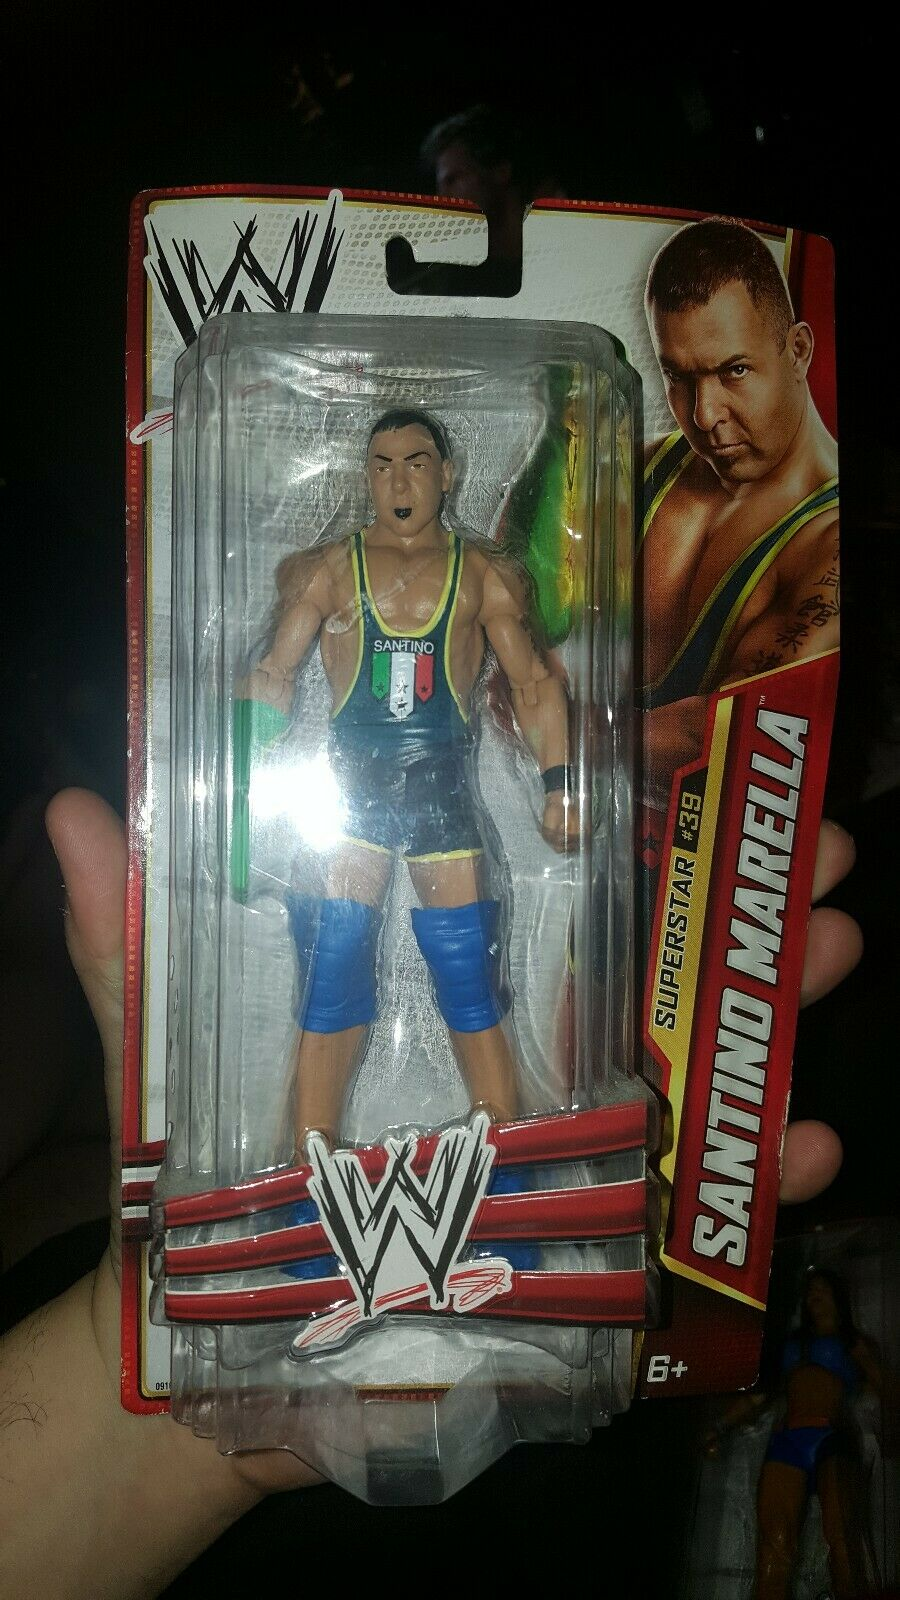 RARE 2013 WWE SuperStar  64 Santino Marella Wrestling  Action Figure  articles de nouveauté